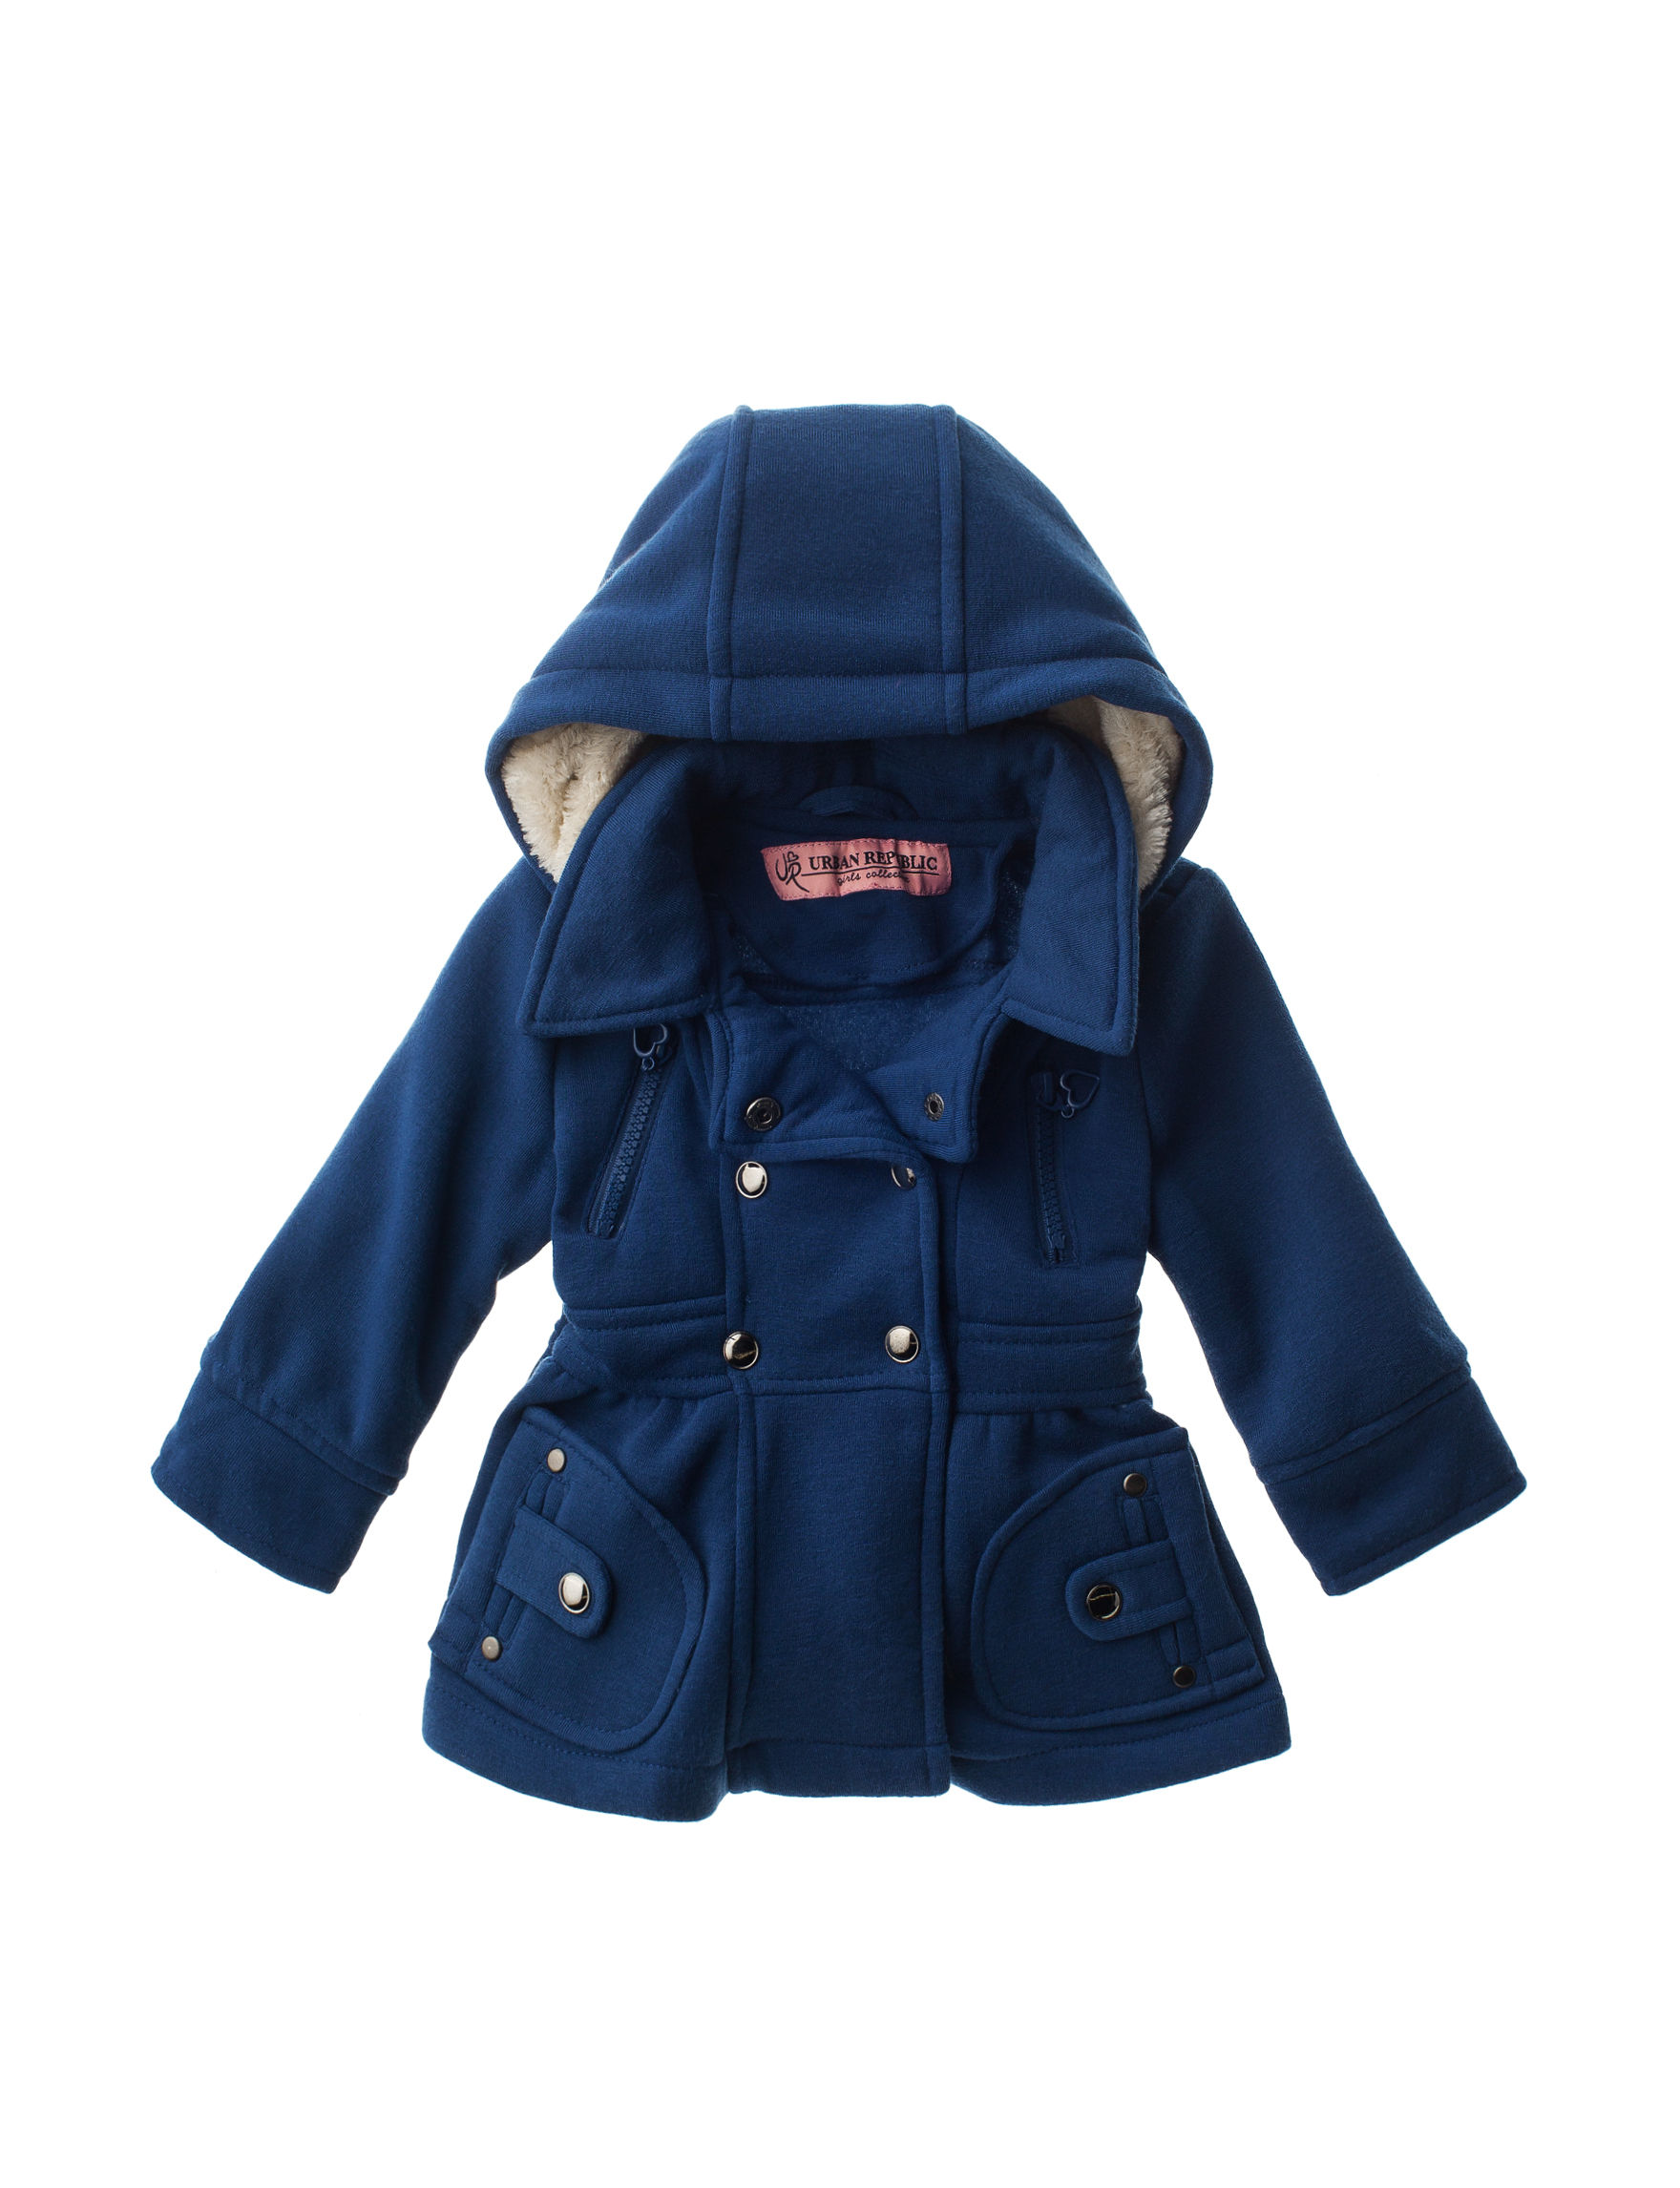 Urban Republic Navy Lightweight Jackets & Blazers